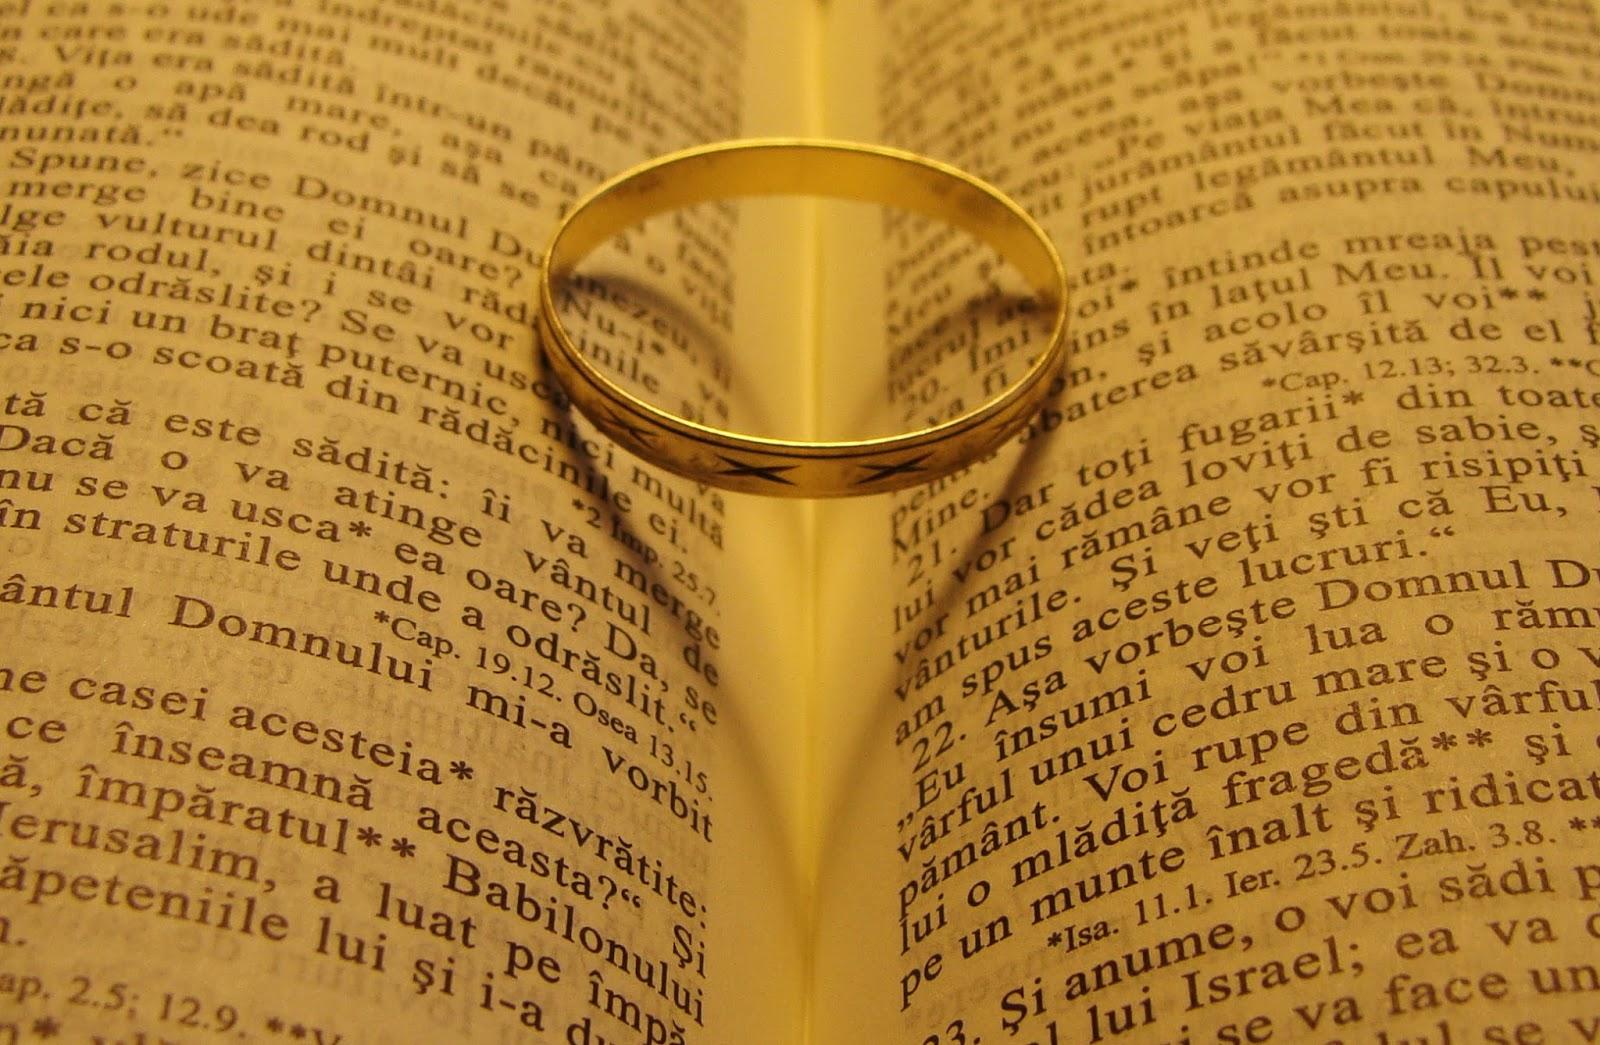 Proverbele RMNN - Cine găseşte o nevastă bună - Bible Gateway